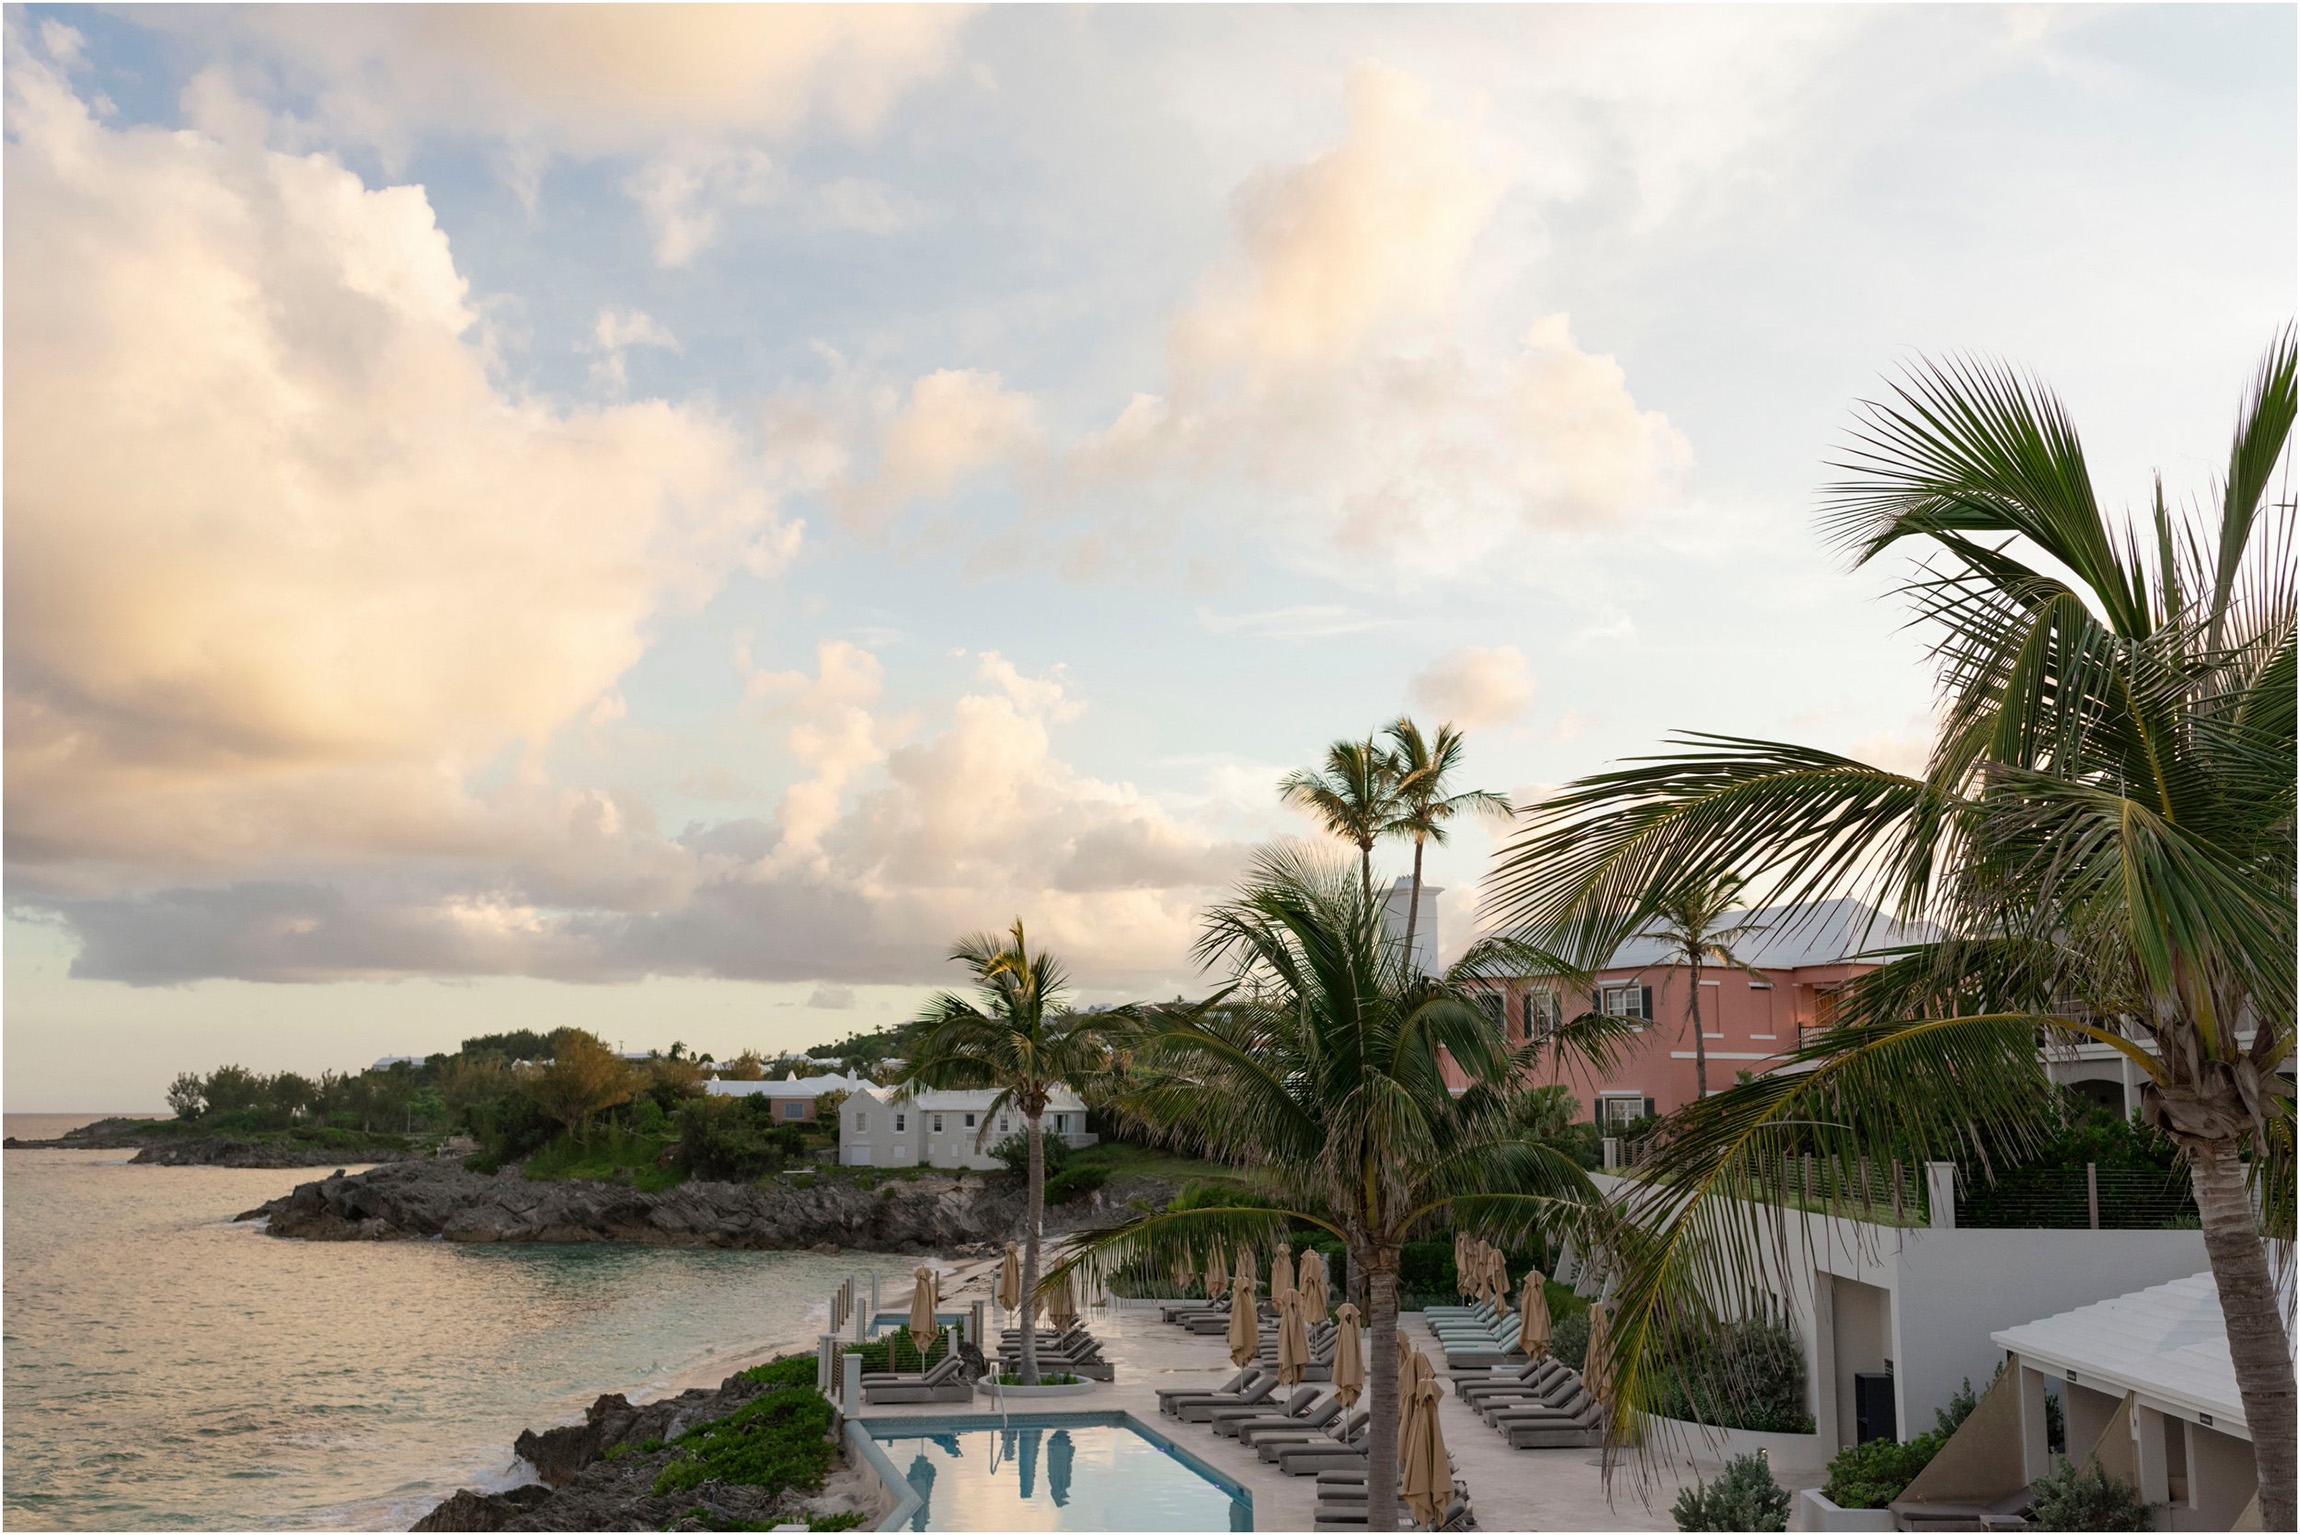 ©FianderFoto_Bermuda_Tom Moore's Jungle_Proposal Maternity Photographer_Erika_Andy_029.jpg